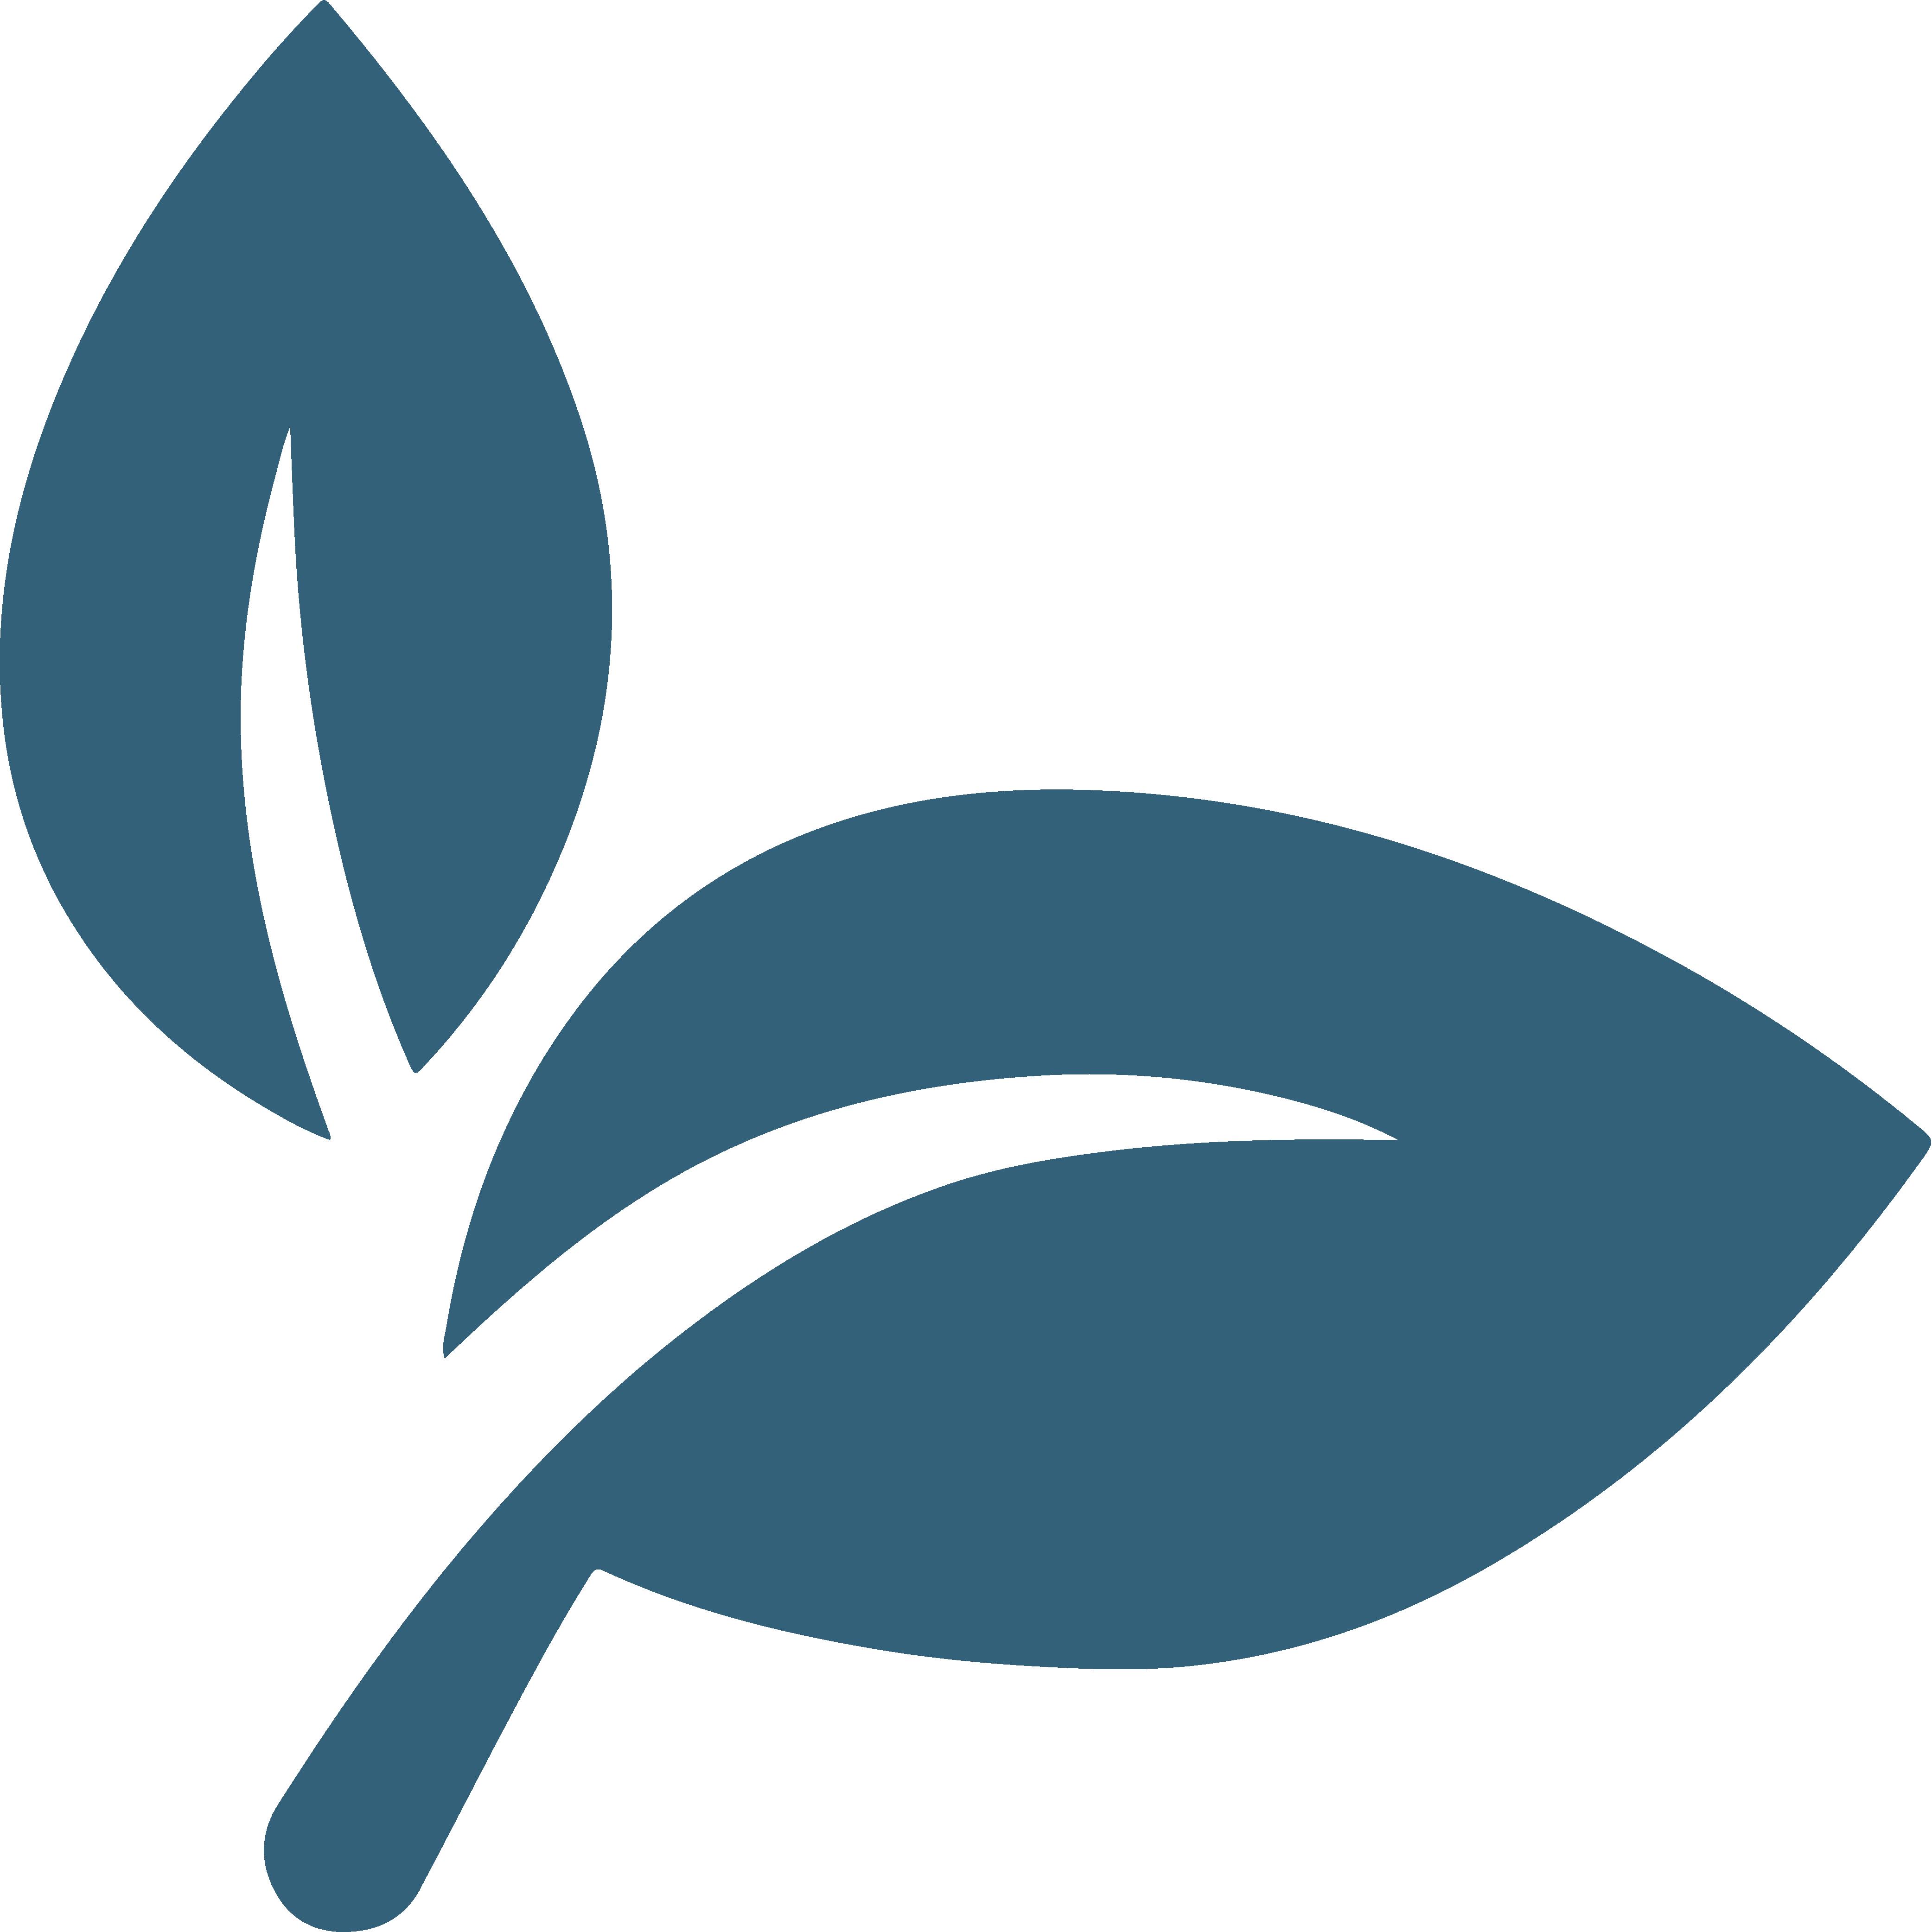 Energy & Environment Club